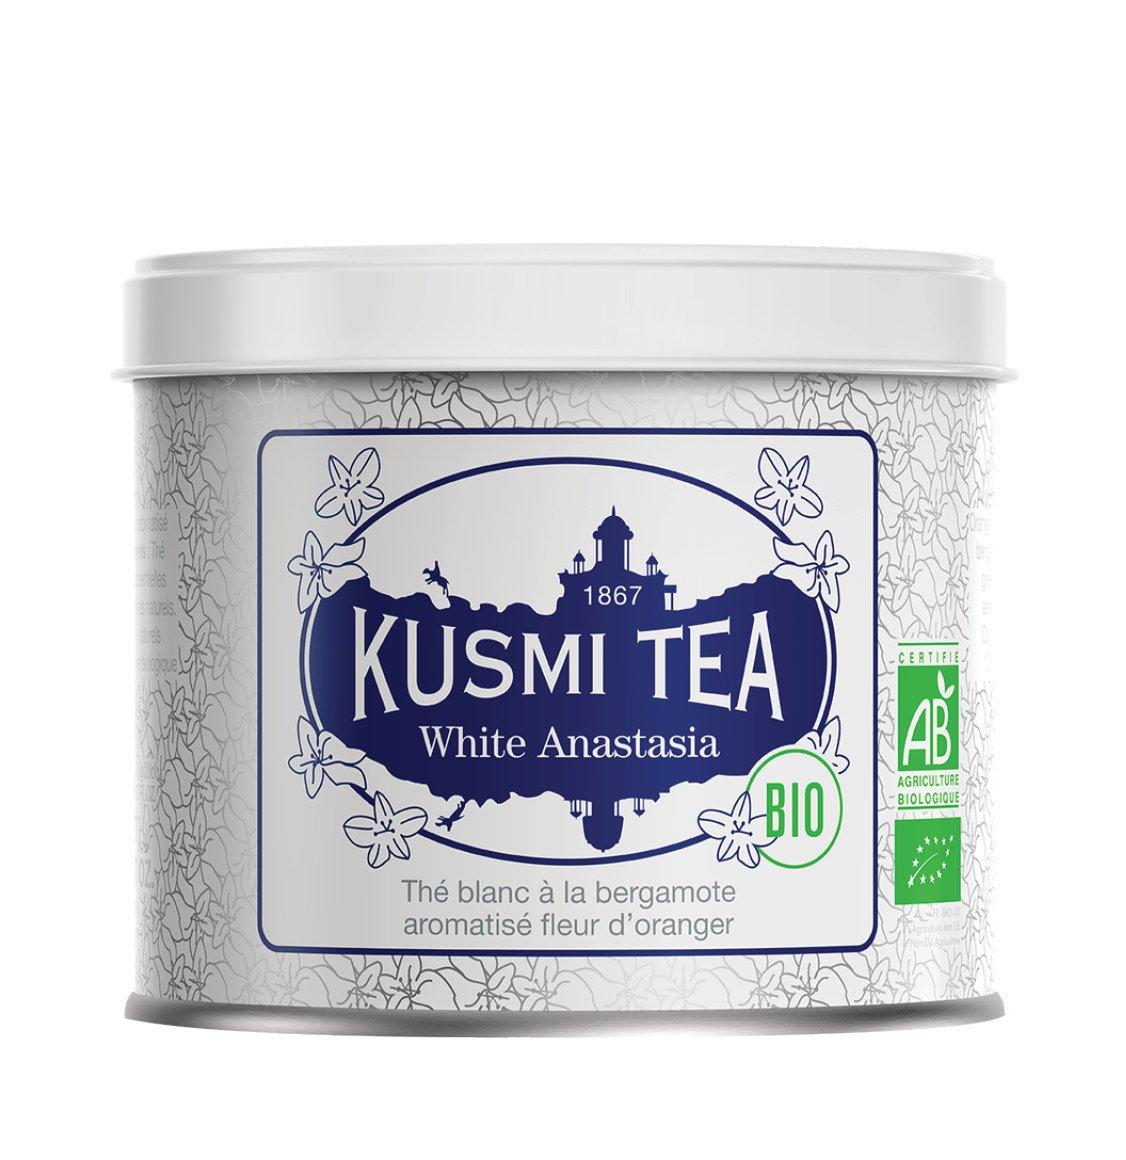 Kusmi Organic White Anastasia Loose Tea 90g